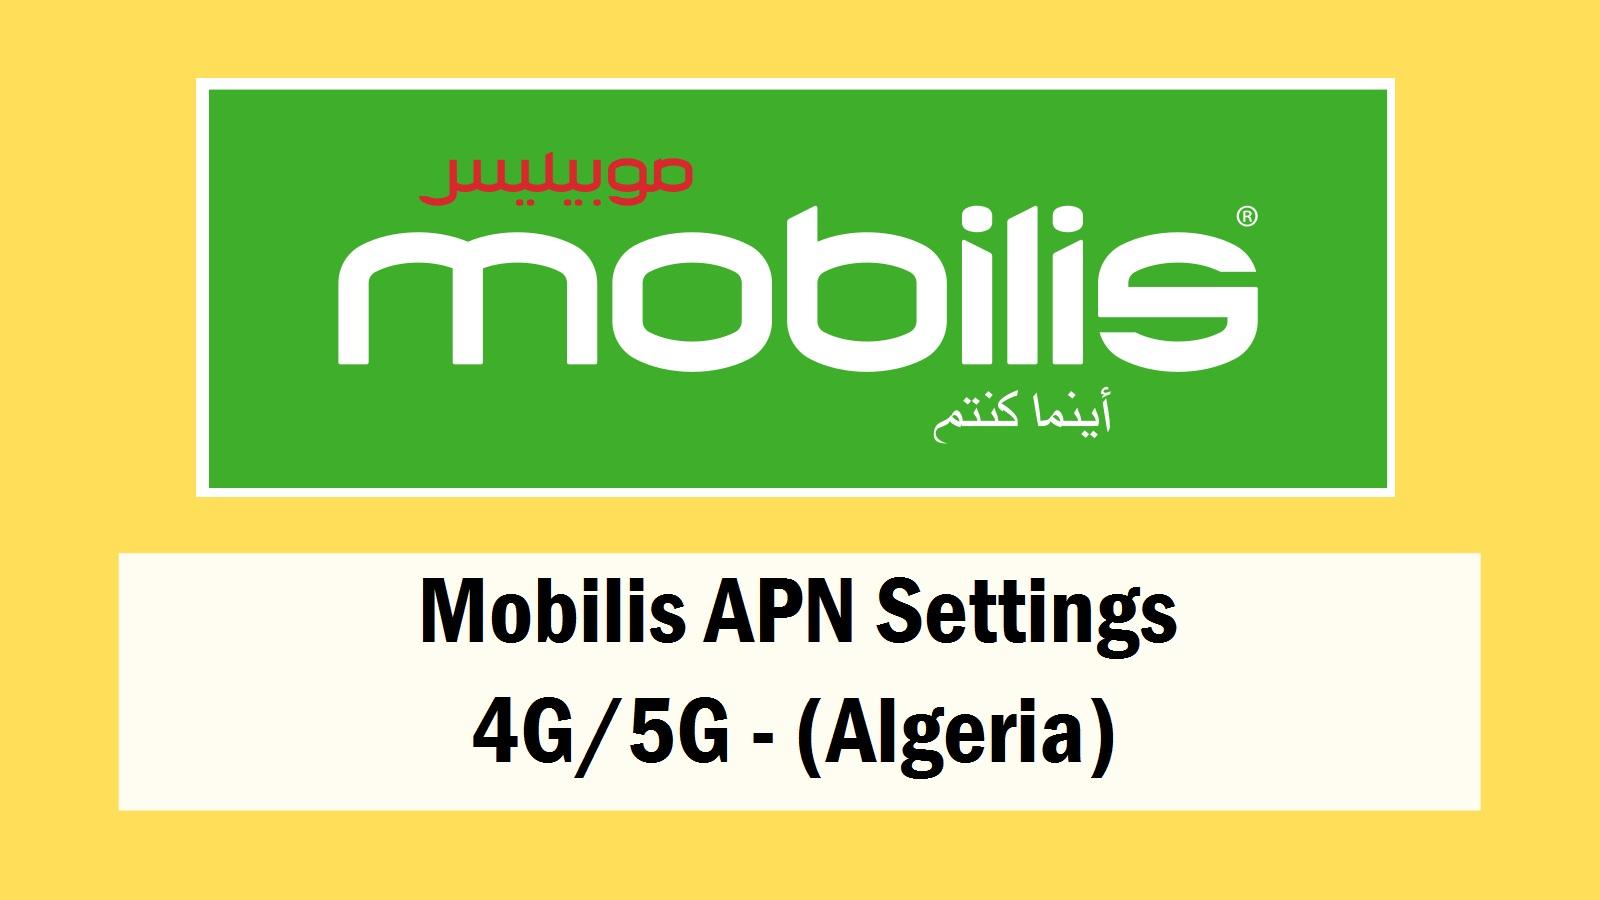 Mobilis APN Settings 4G/5G